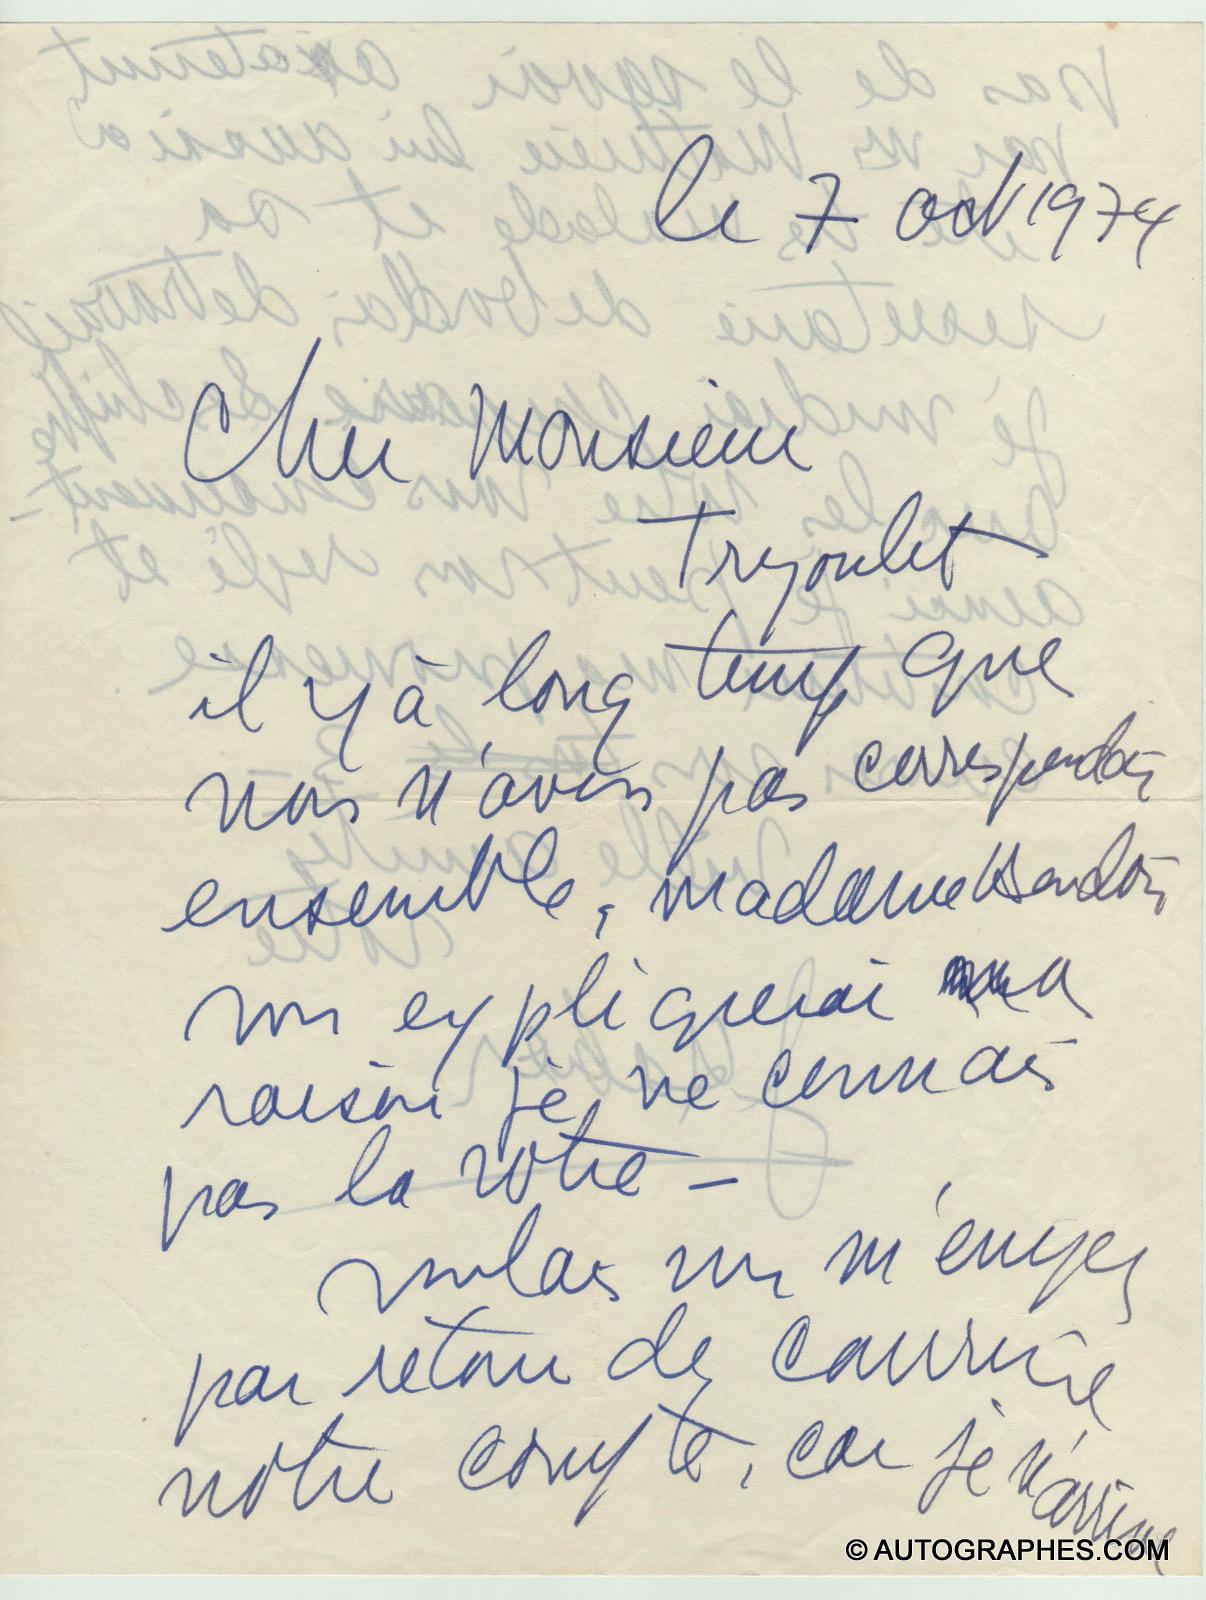 lettre-autographe-signee-josephine-baker-1974-1